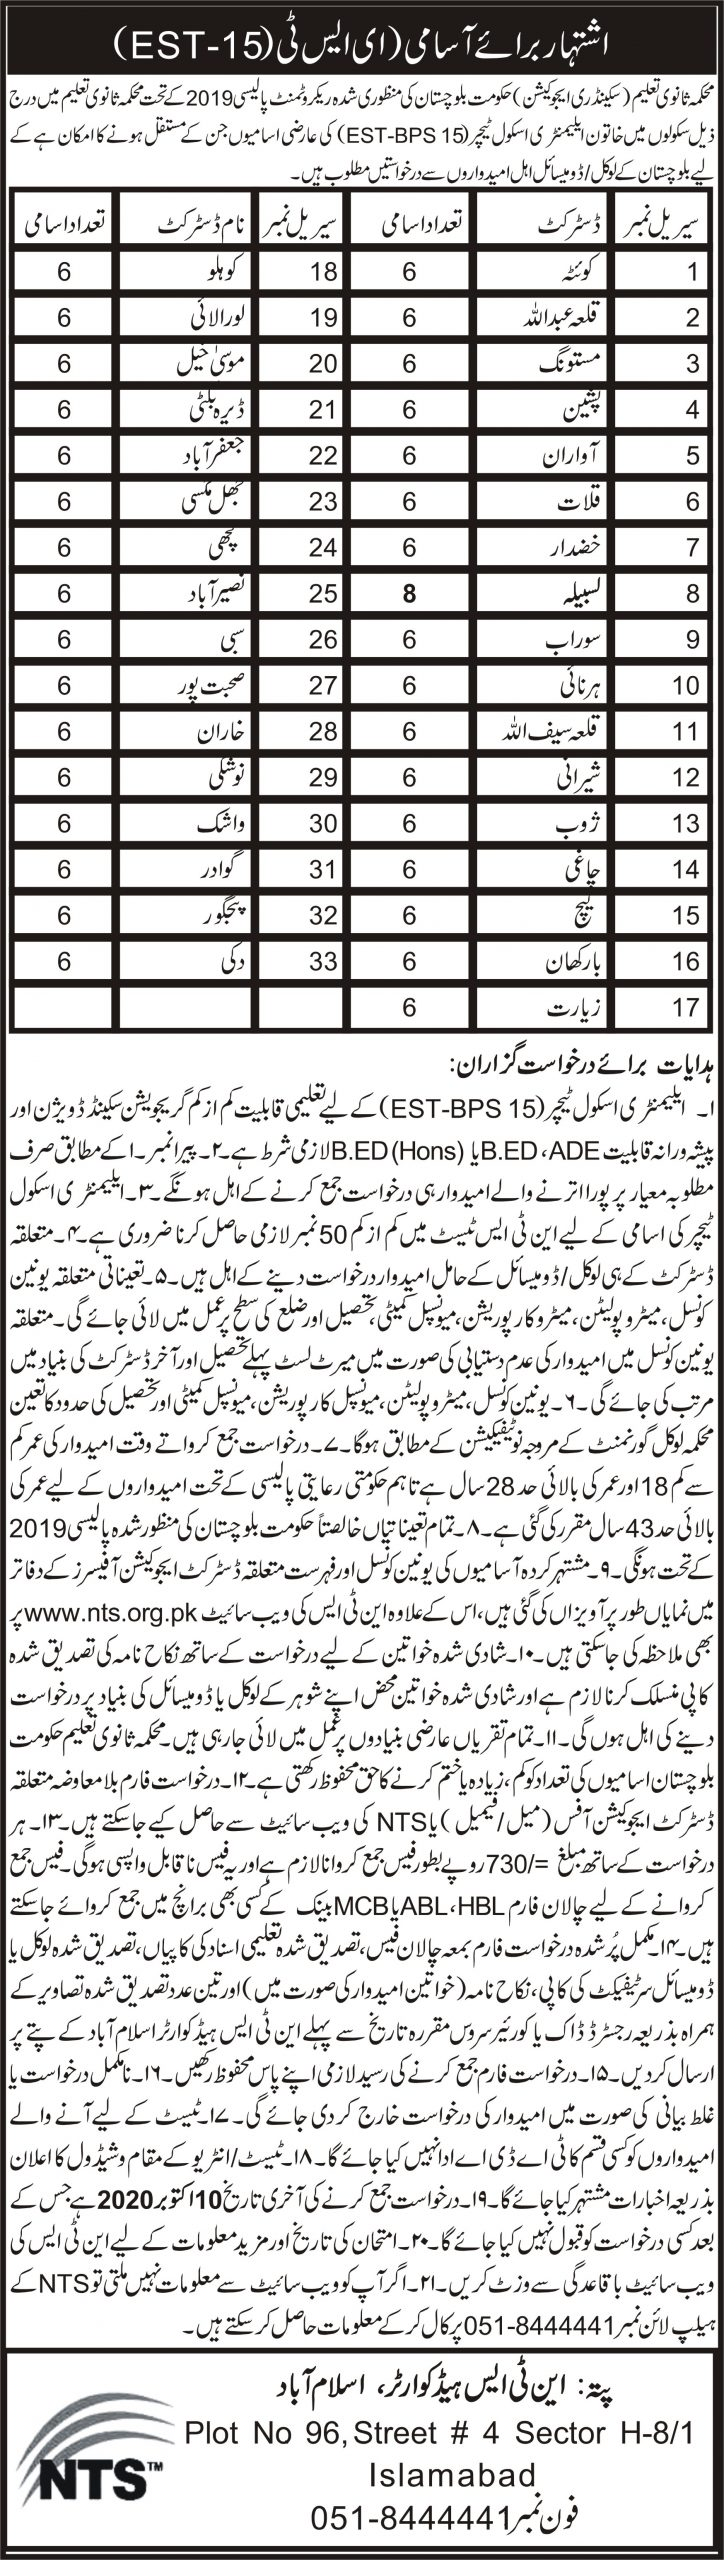 NTS Elementary School Teacher EST Balochistan Jobs 2021 Application Form Download Online